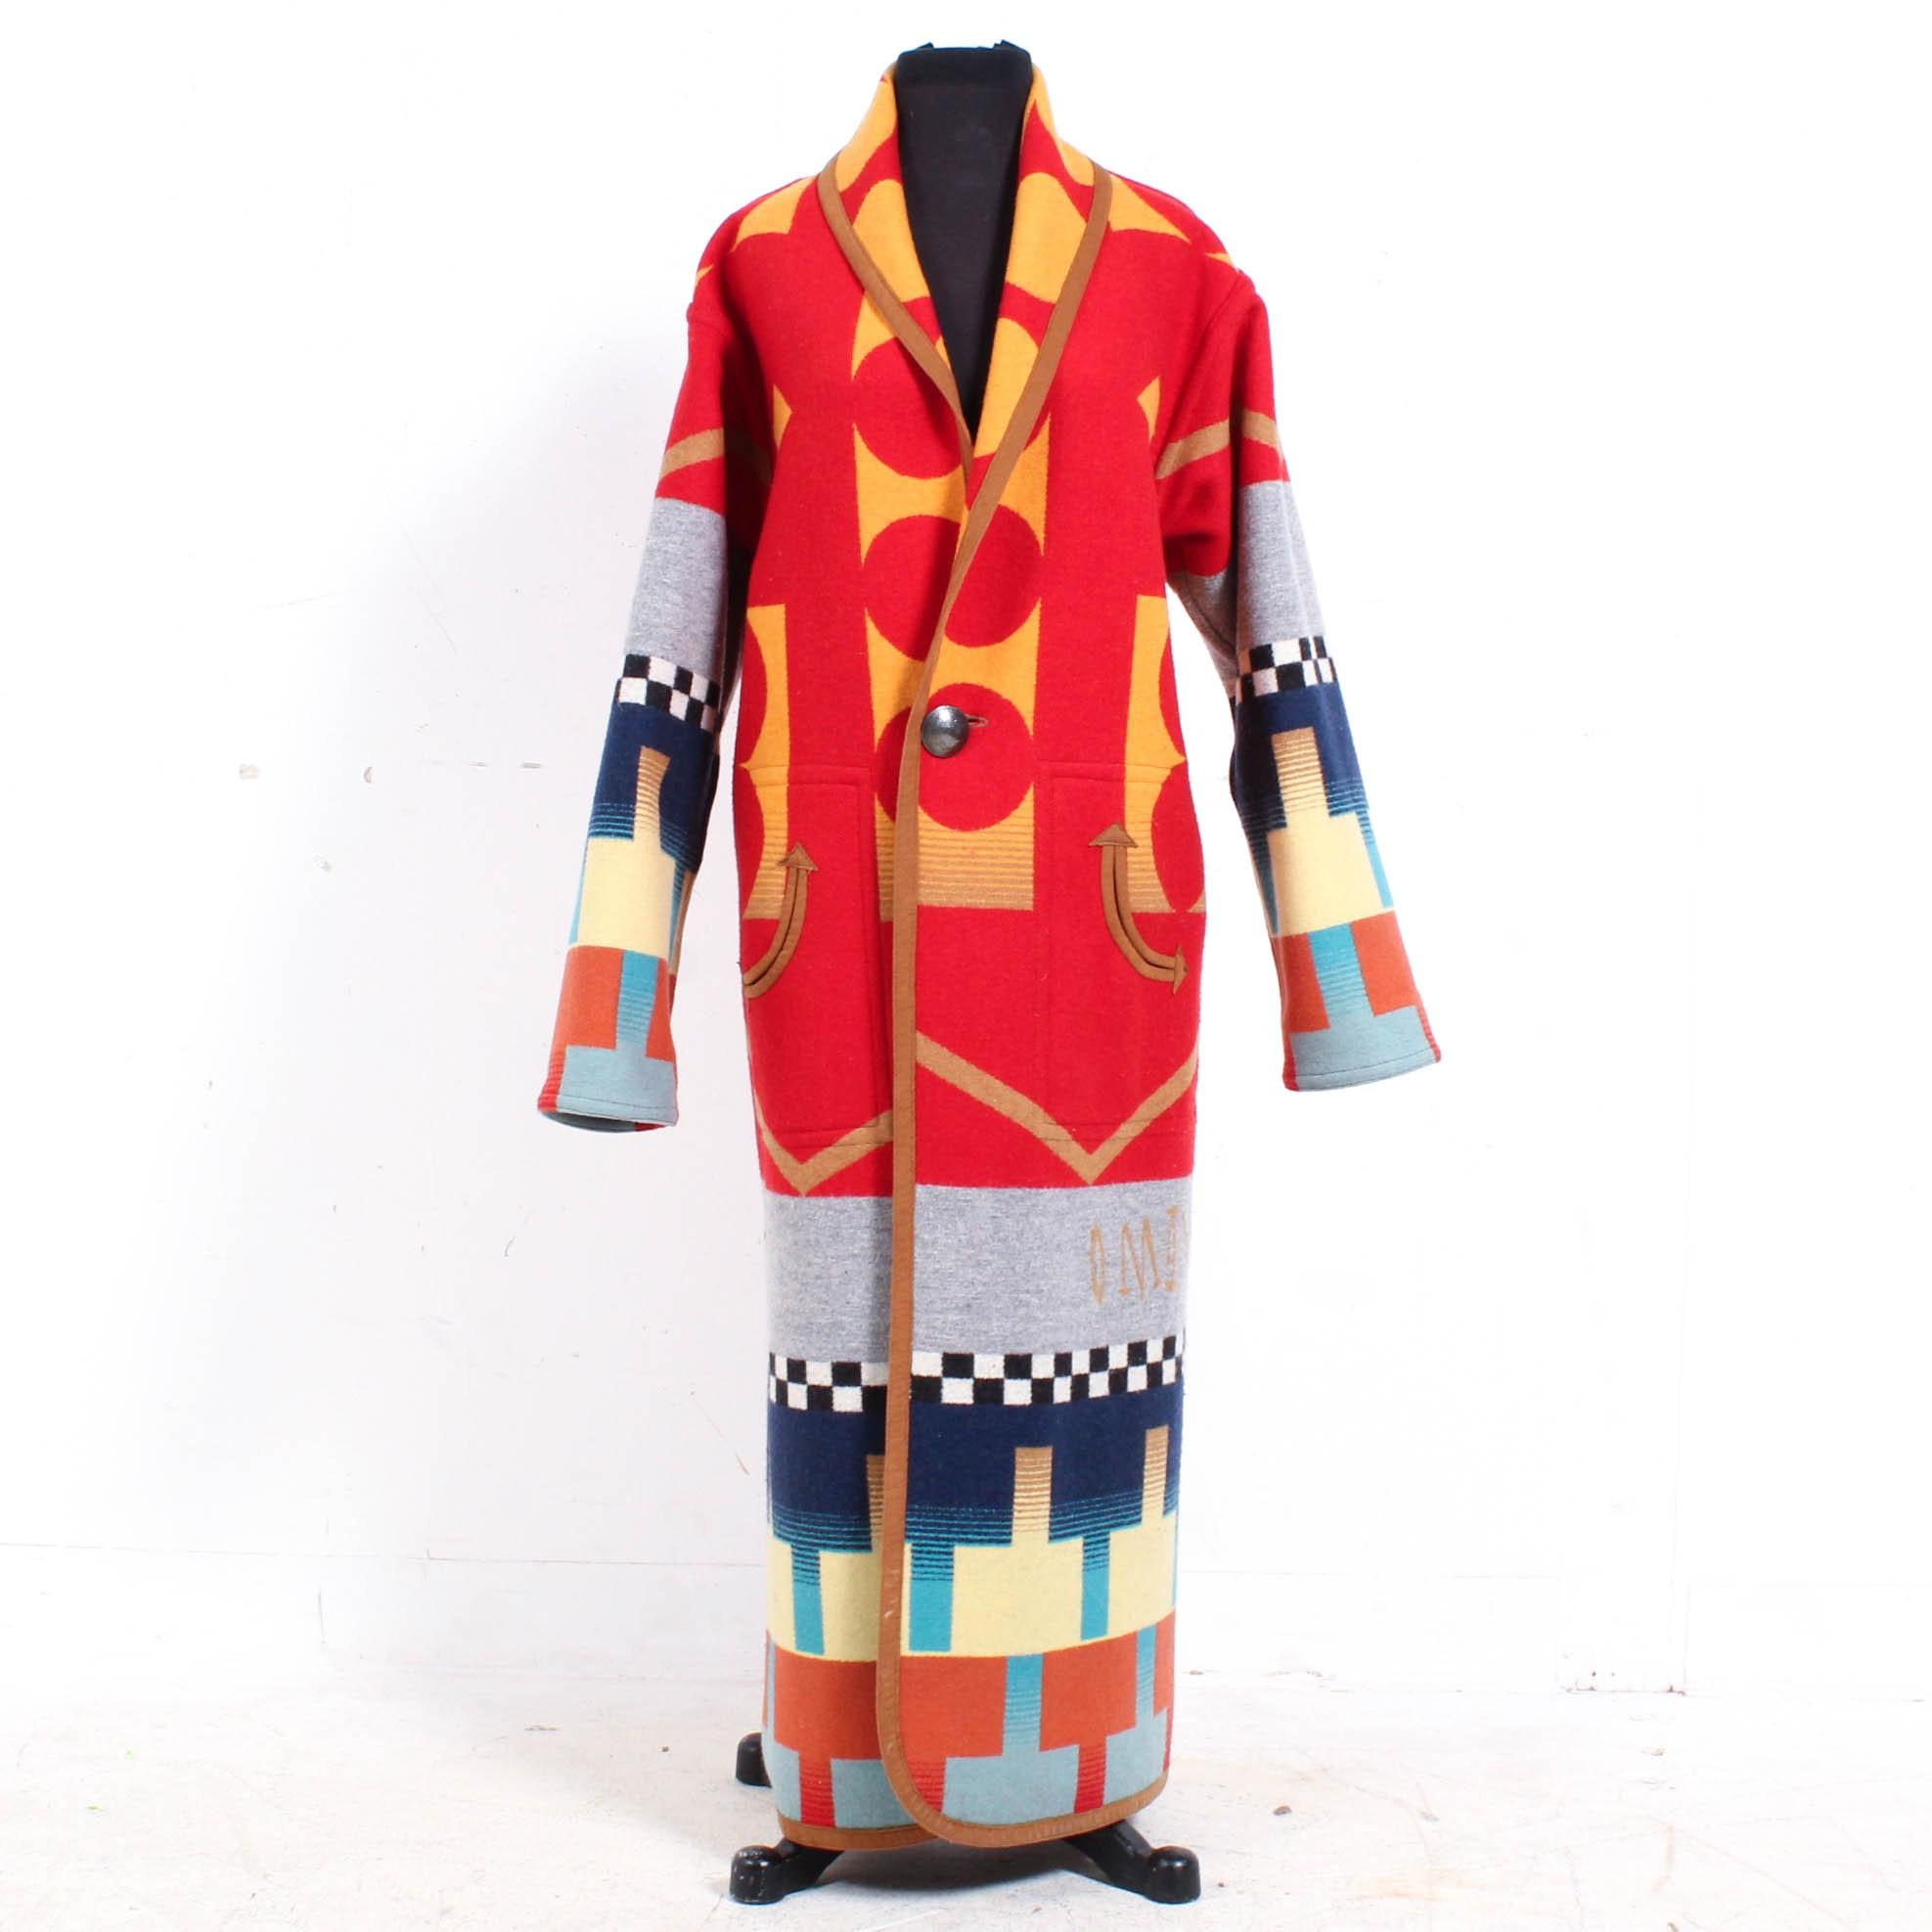 Pendleton Southwestern-Style Reversible Blanket Coat